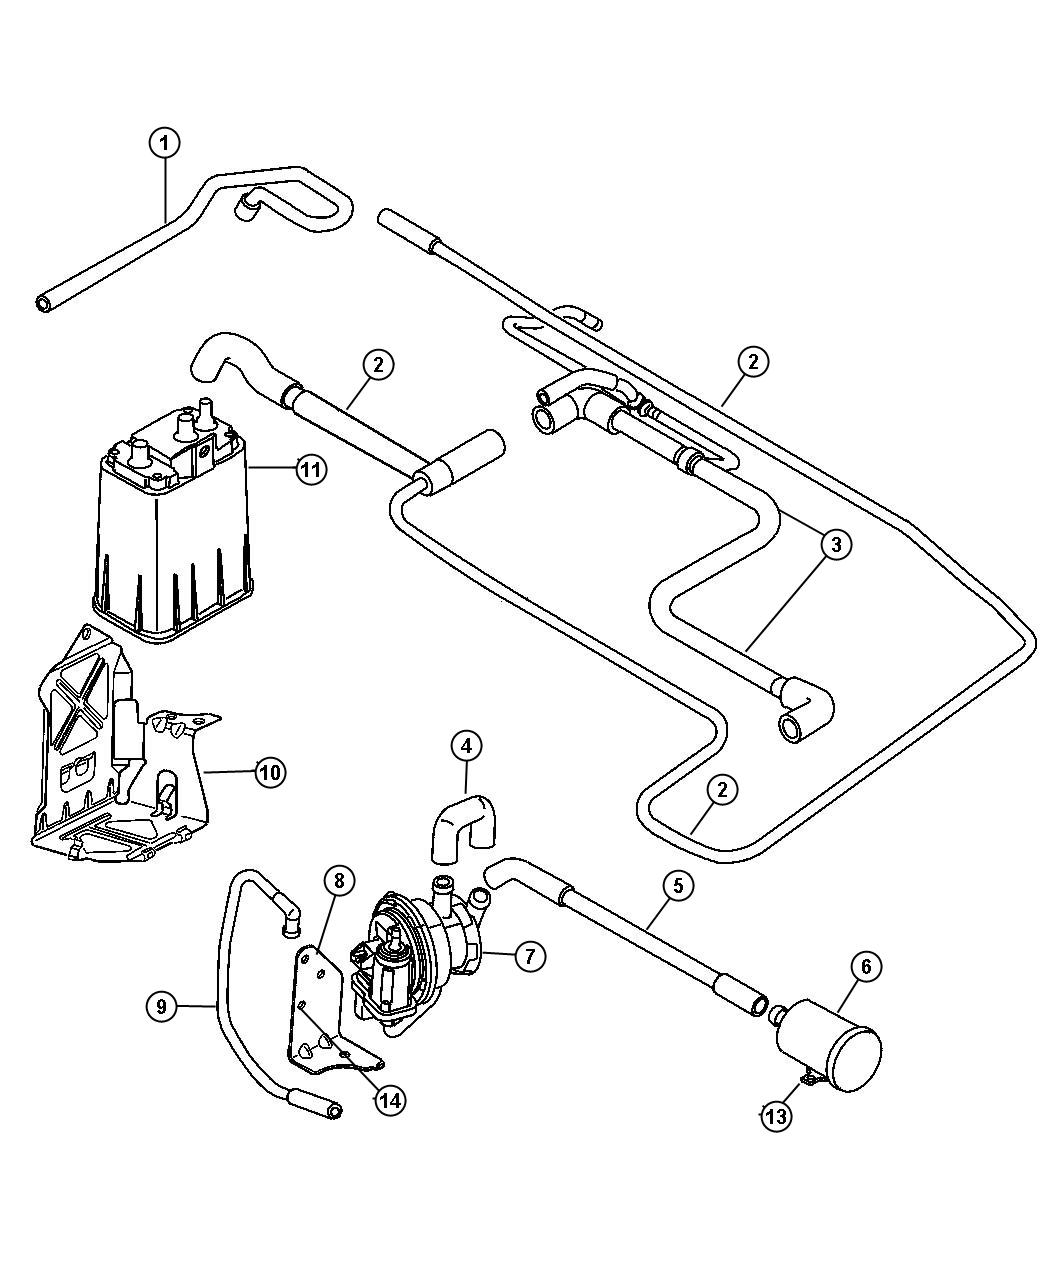 2001 Chrysler Pt Cruiser Pump  Leak Detection  Emissions  Tethered  Tank